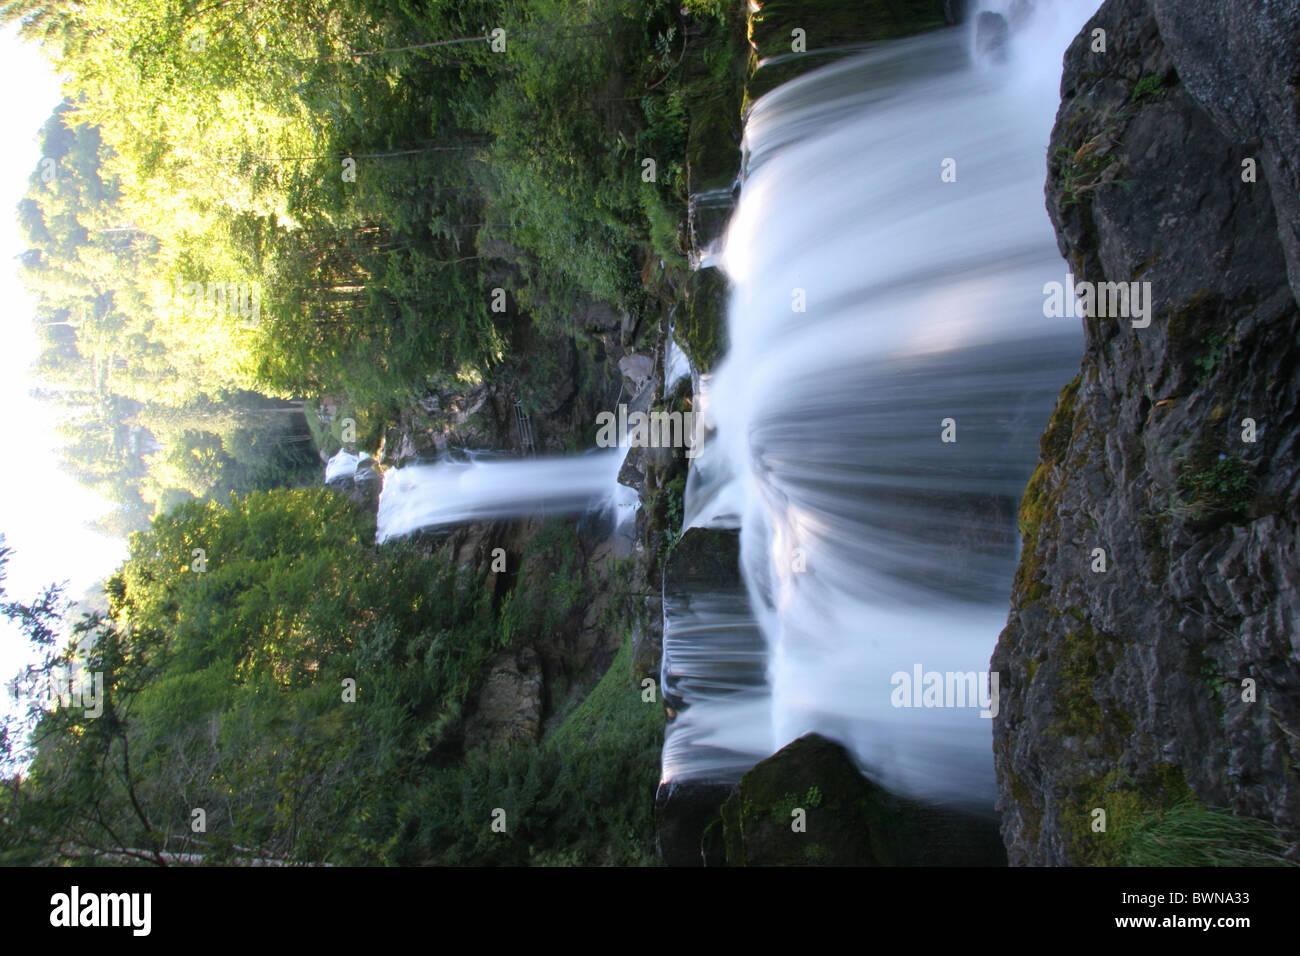 Switzerland Europe Brienz Giessbach falls Bernese Oberland Canton Berne Bern Giessbachfalle Waterfall landsca Stock Photo